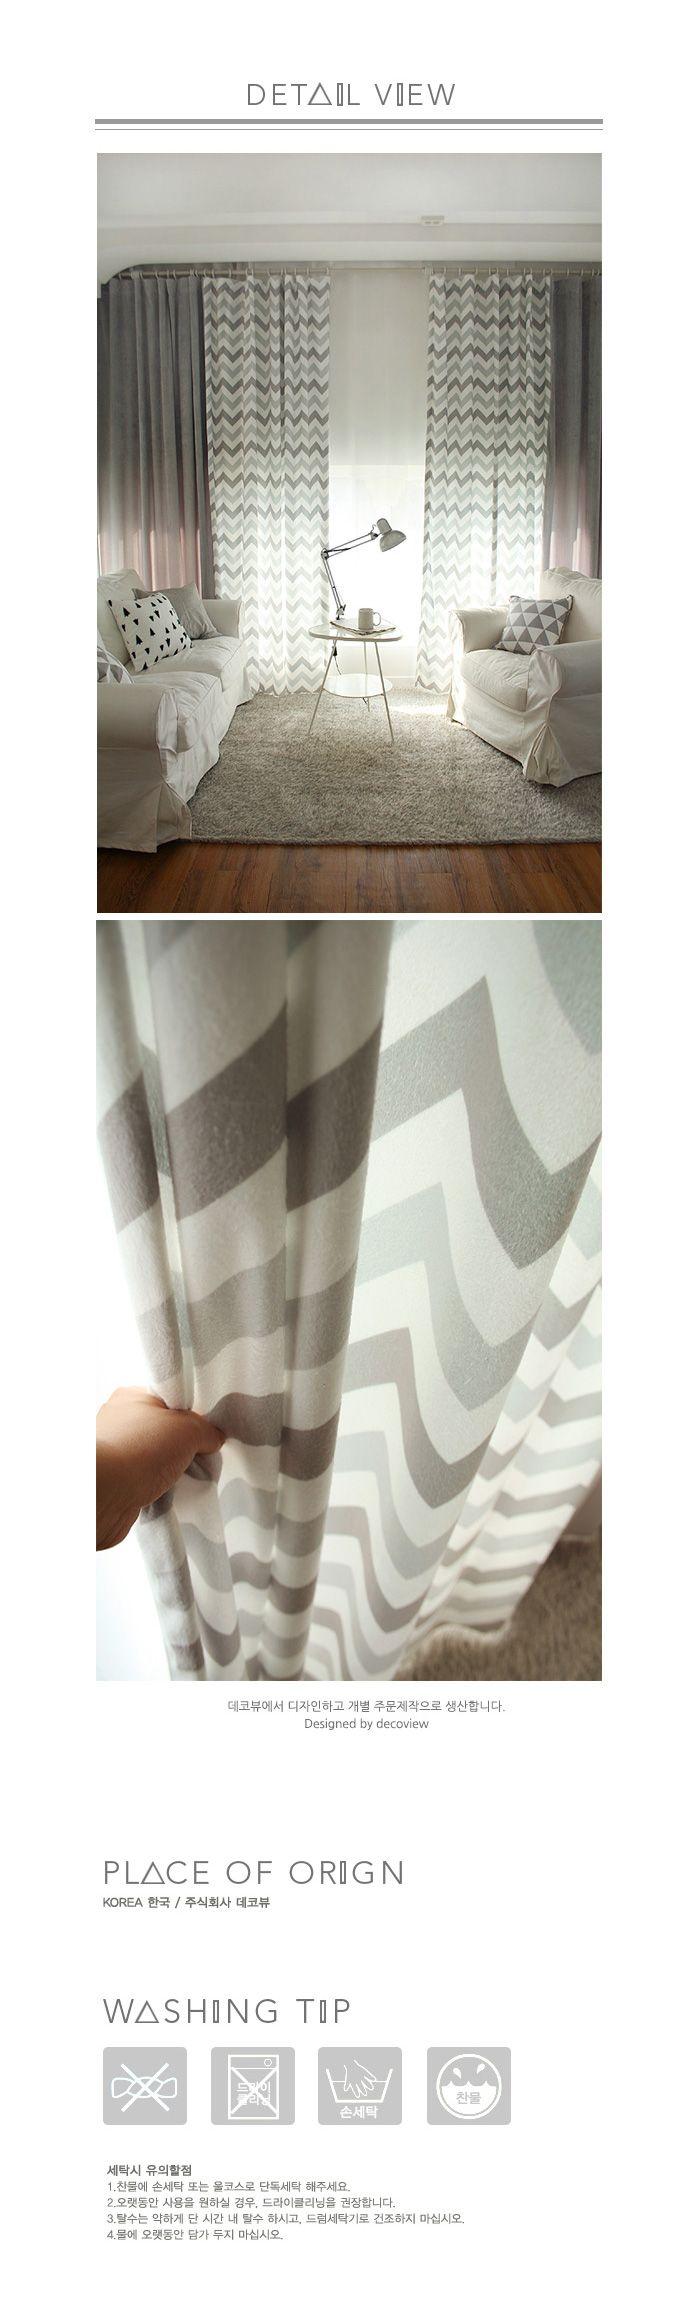 curtains, living room. 북유럽 지그재그 극세사 방한커튼 :: 1300K.com